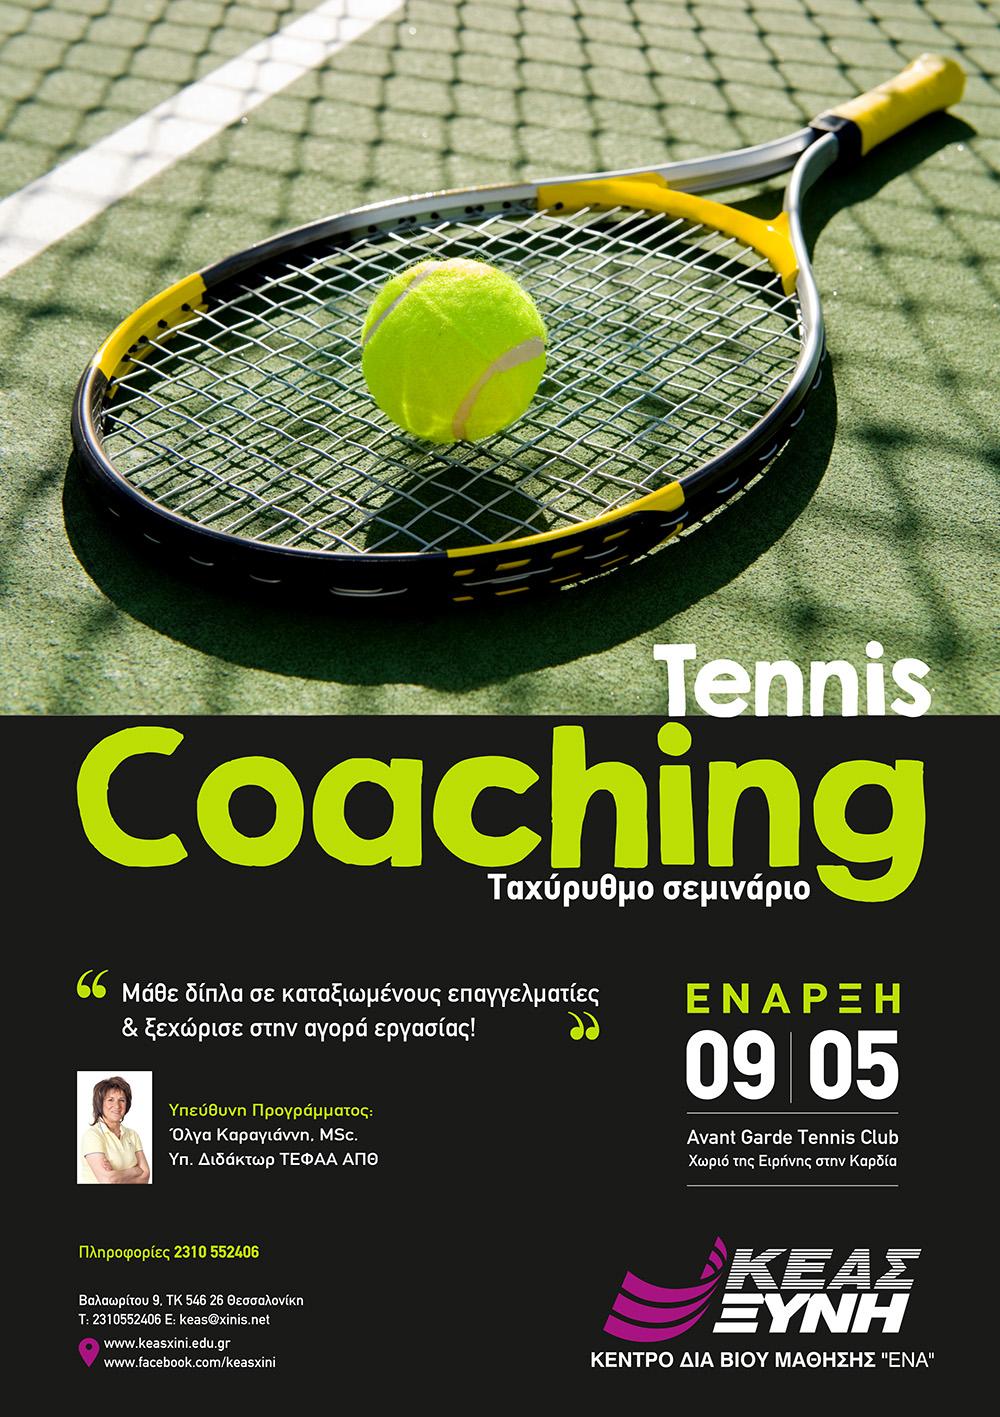 Tennis-Coaching.jpg